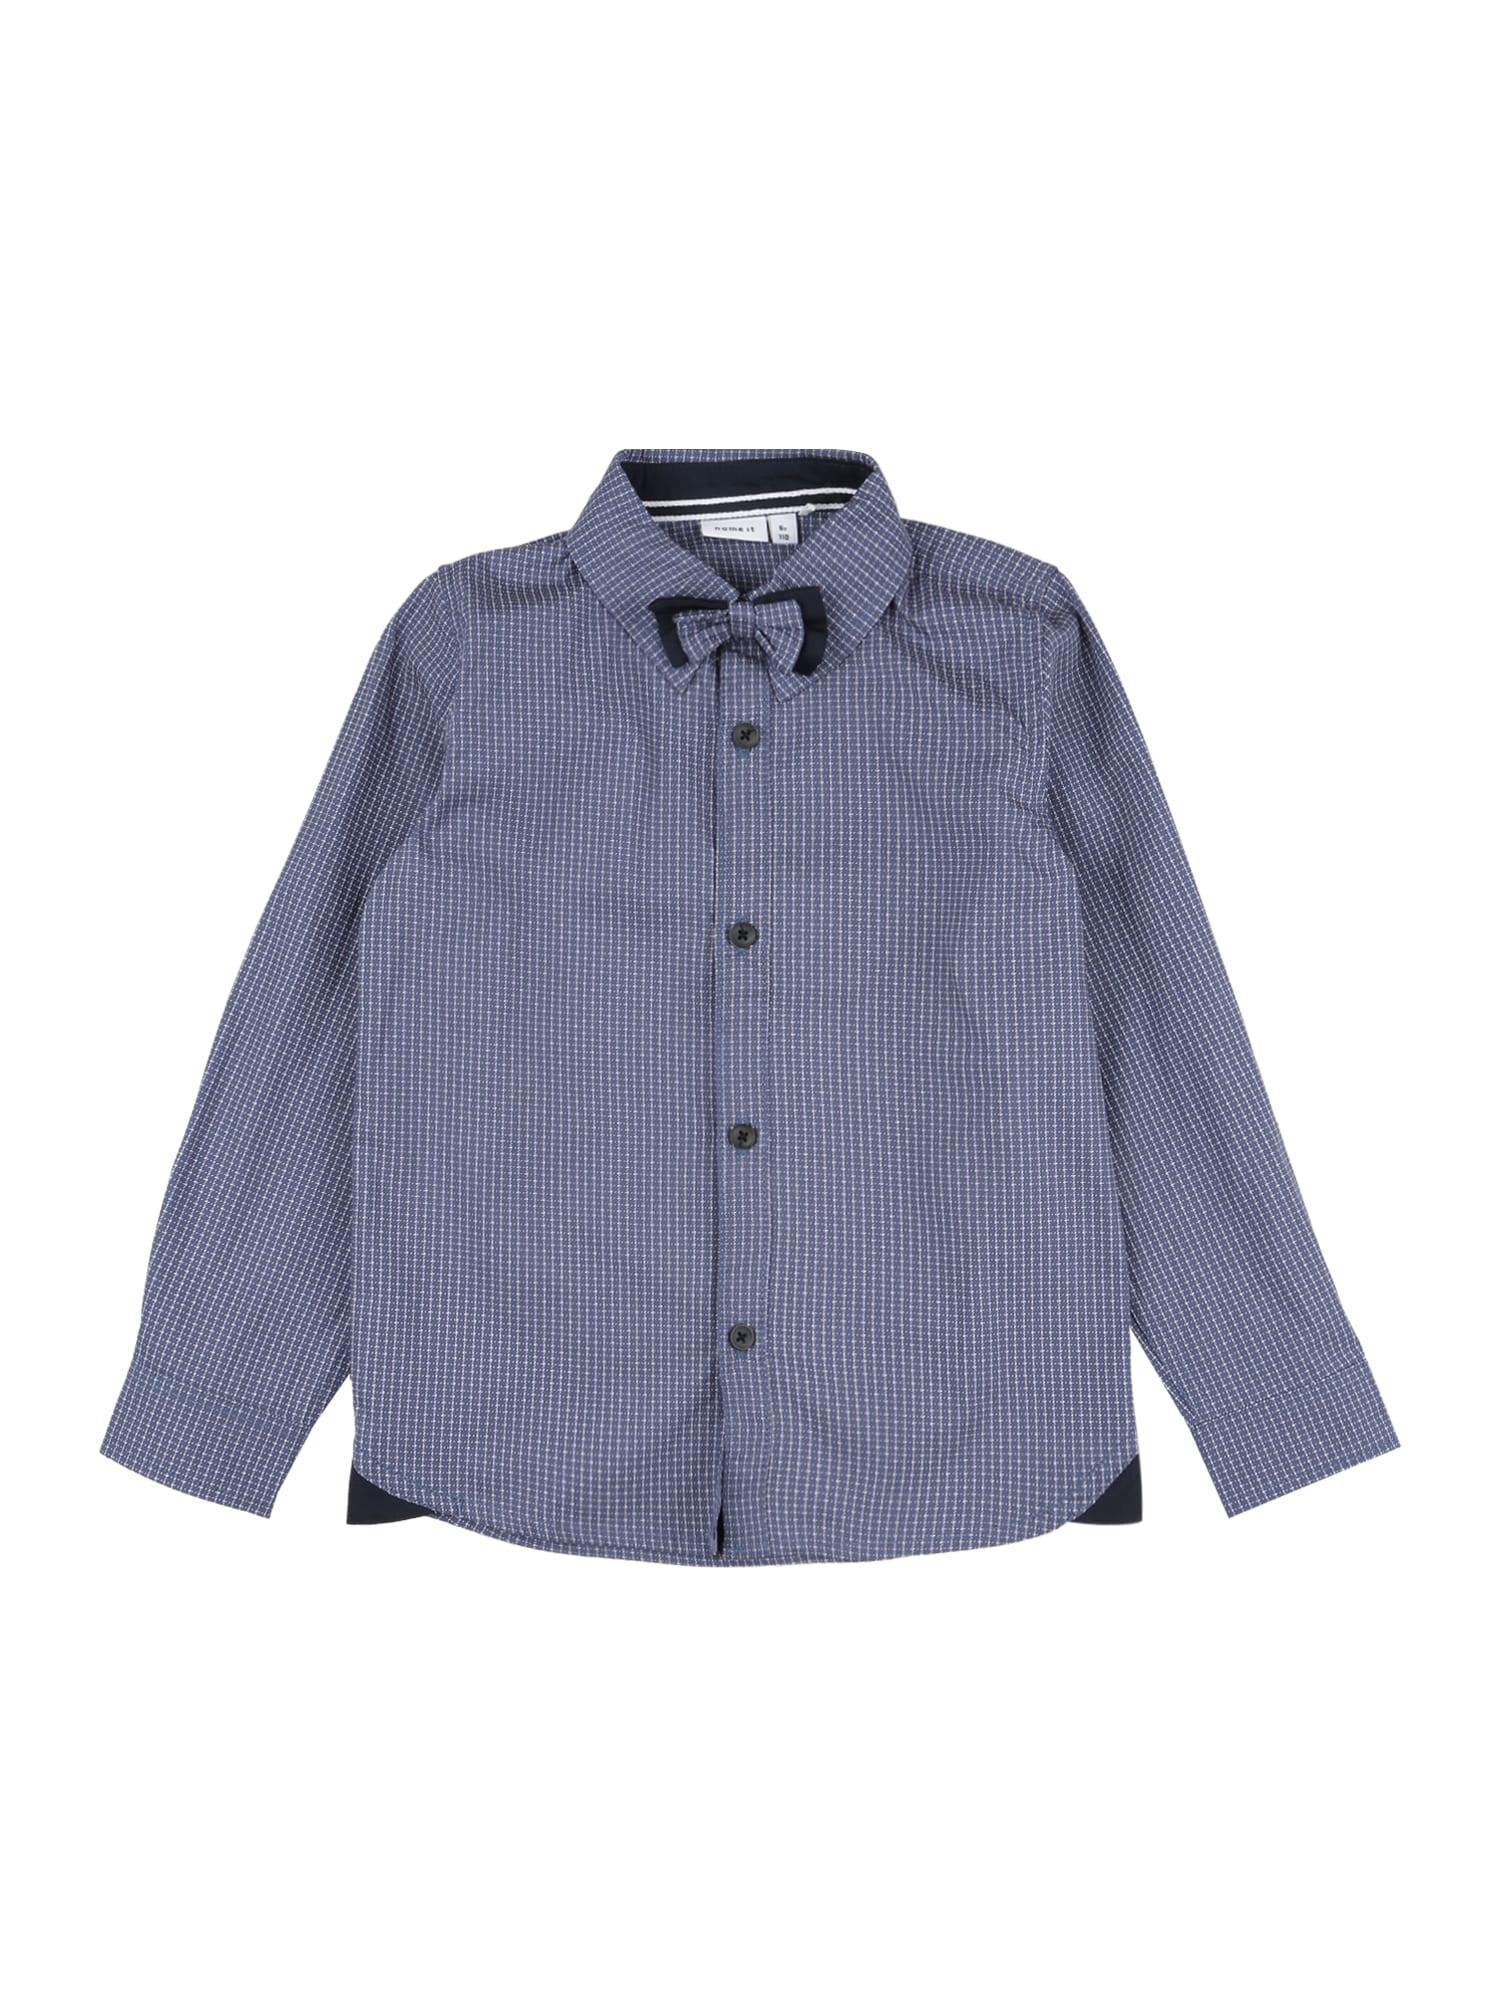 NAME IT Marškiniai 'ROHAN' mėlyna / balta